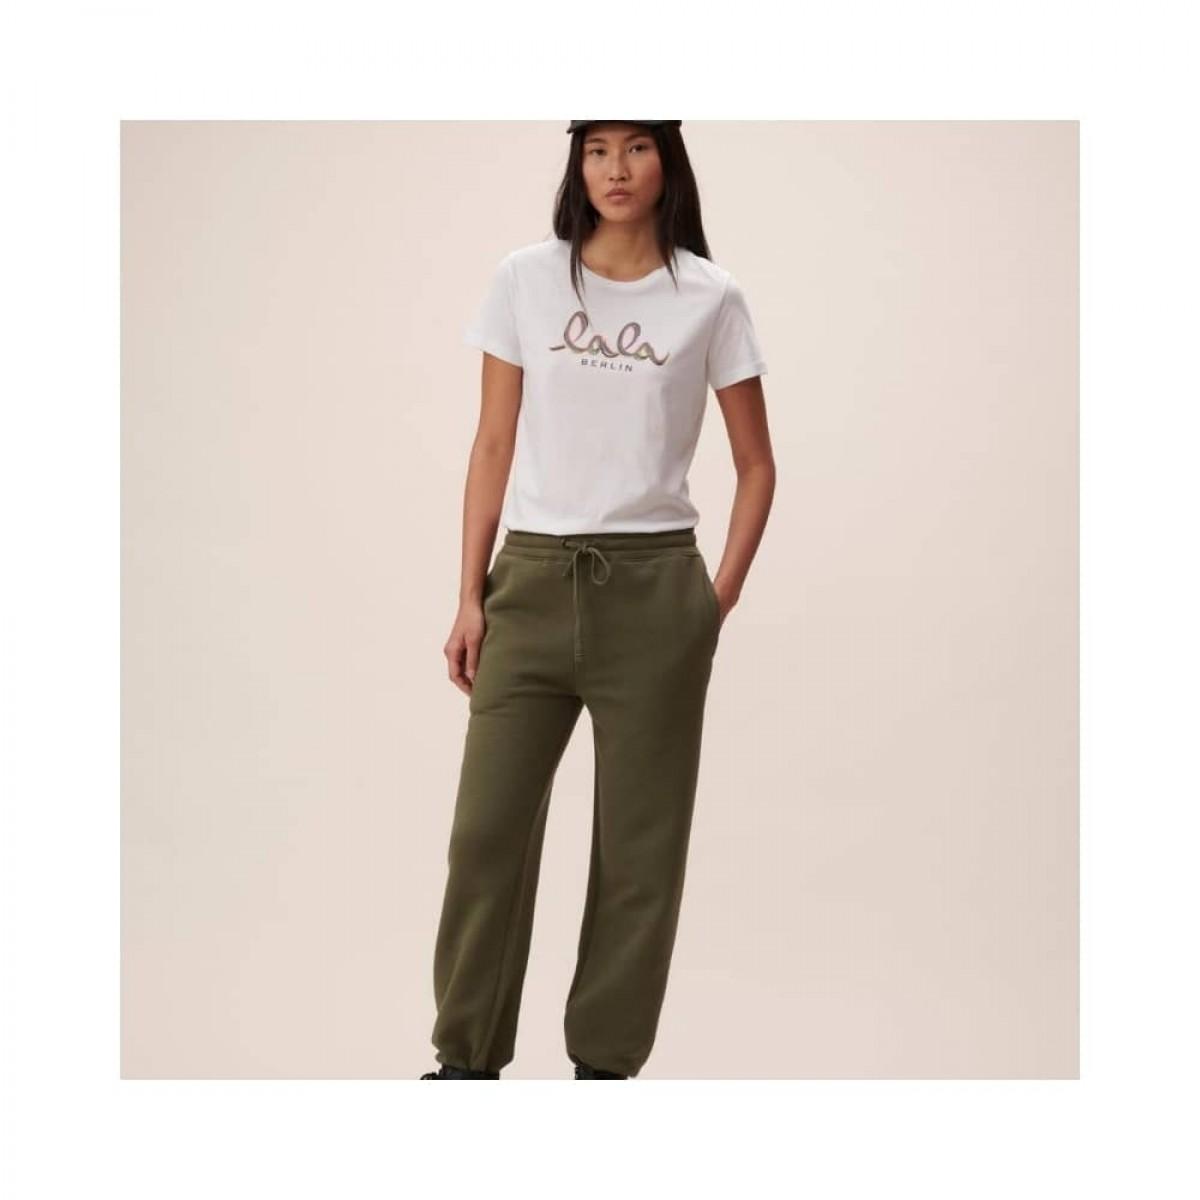 cara t-shirt rainbow - white - model front